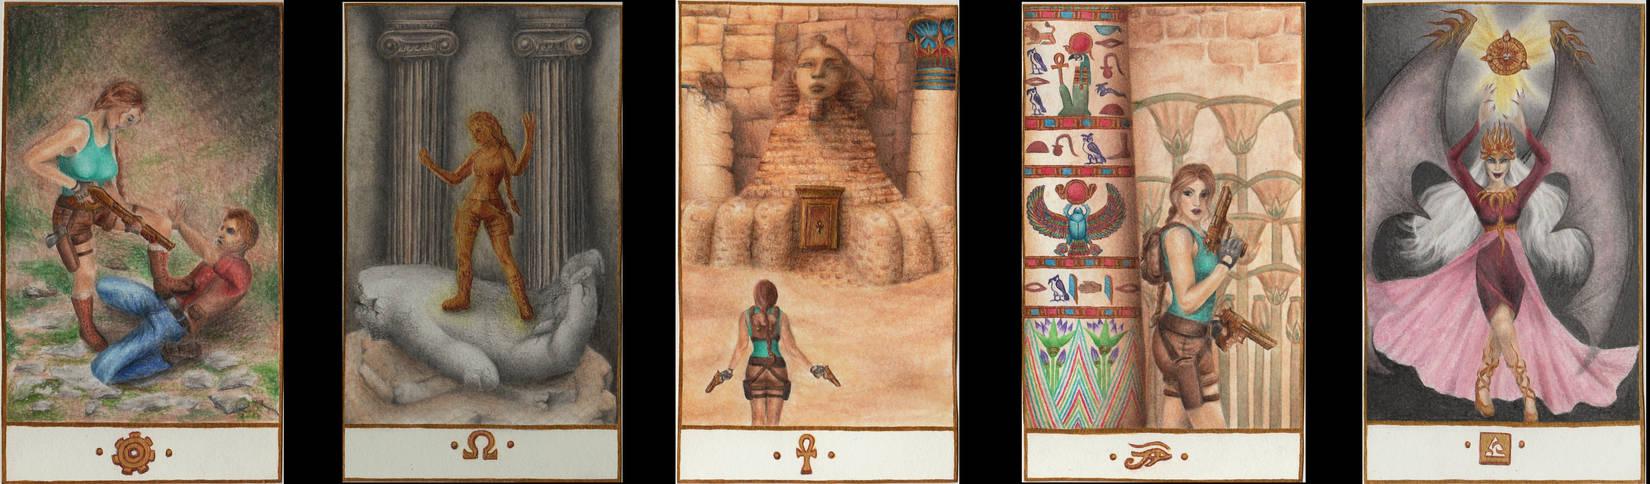 Tomb Raider Card Design